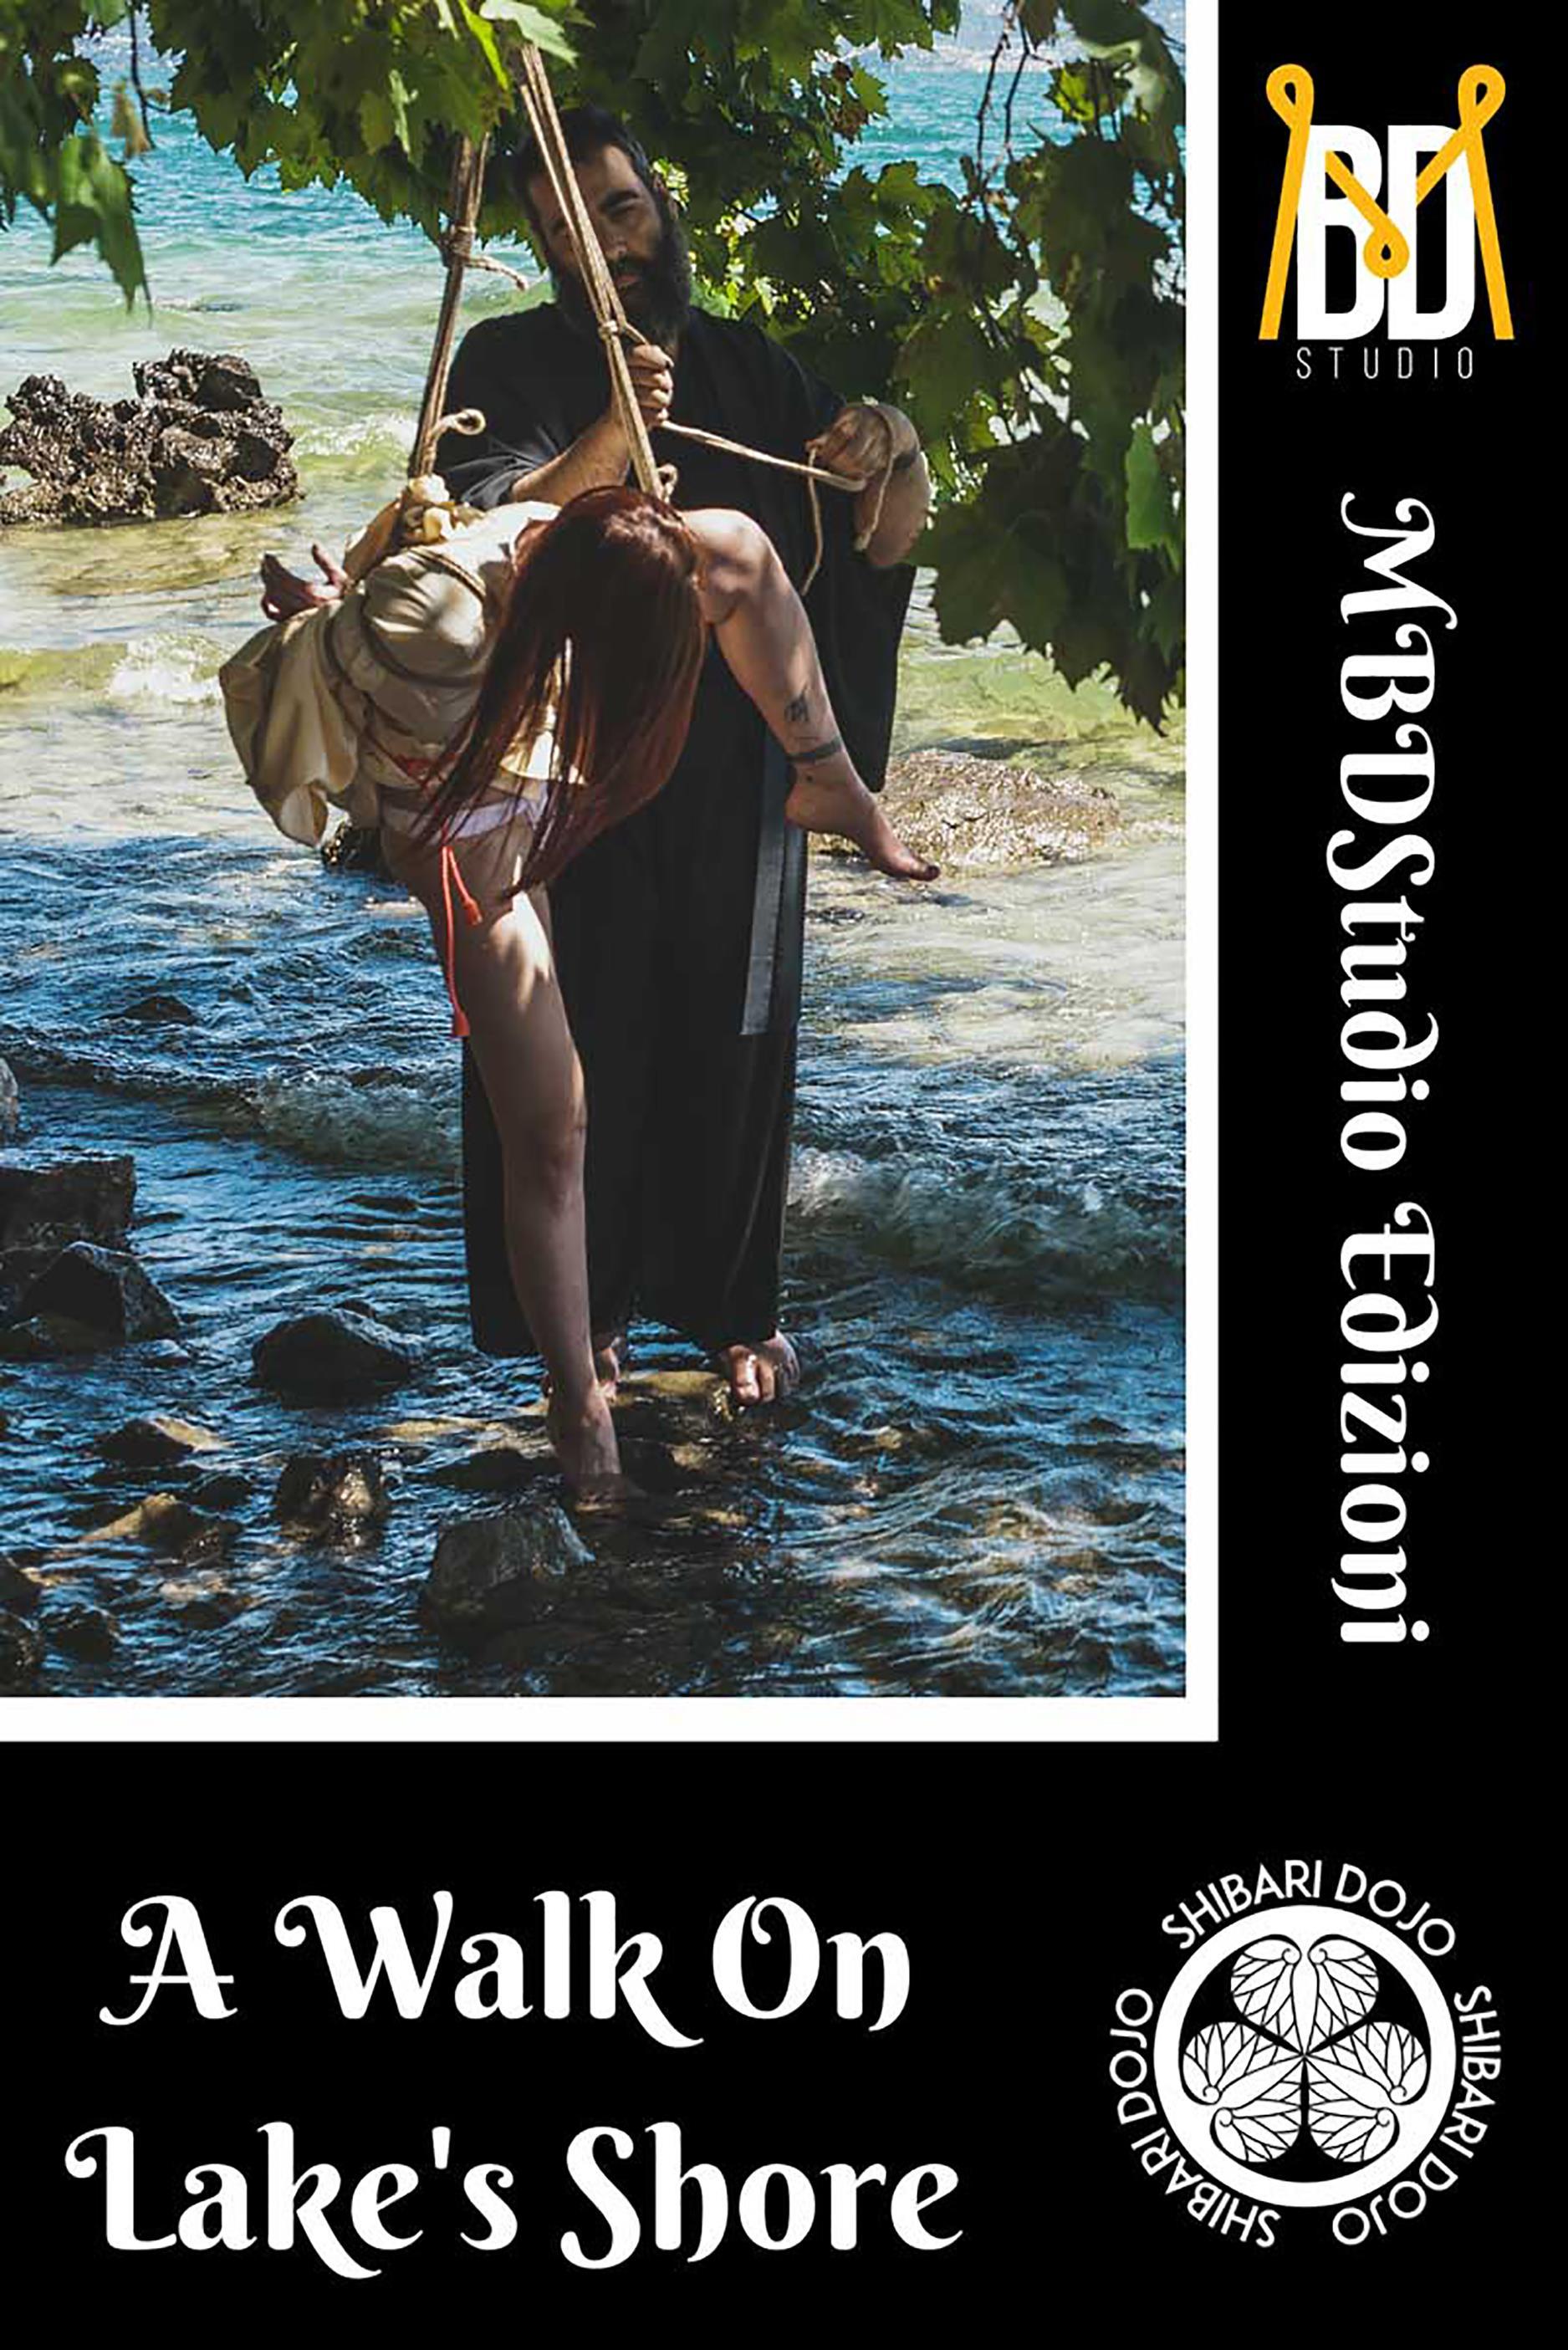 A Walk On Lake Shore - A Shibari Project by MBDStudio